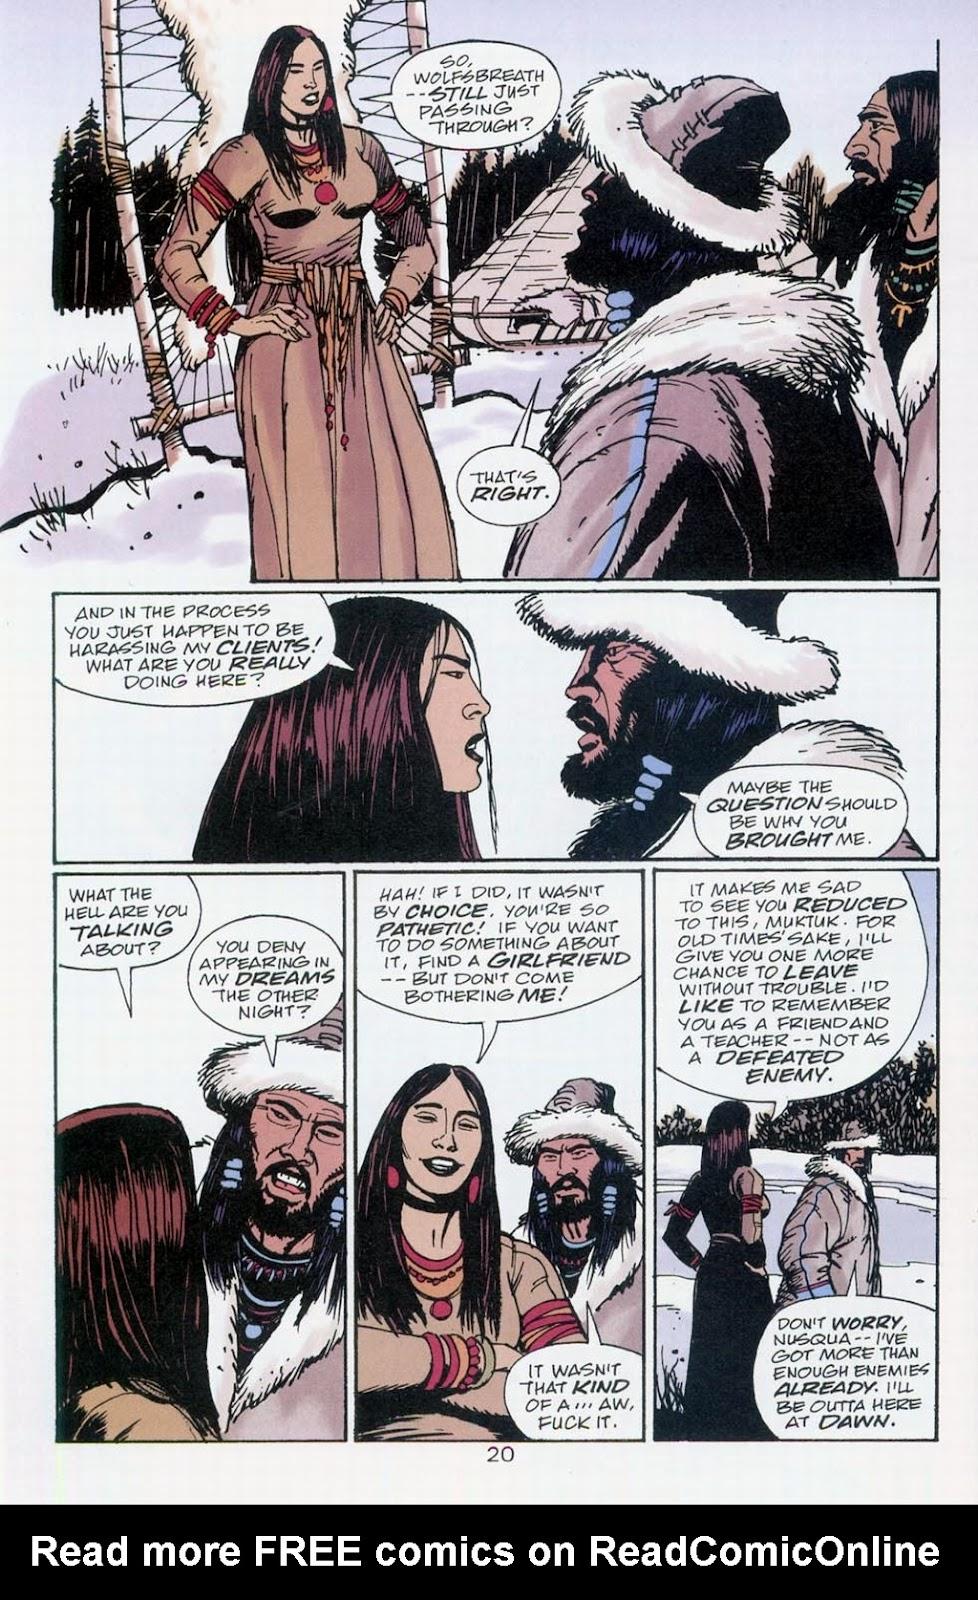 Muktuk Wolfsbreath: Hard-Boiled Shaman issue 1 - Page 20